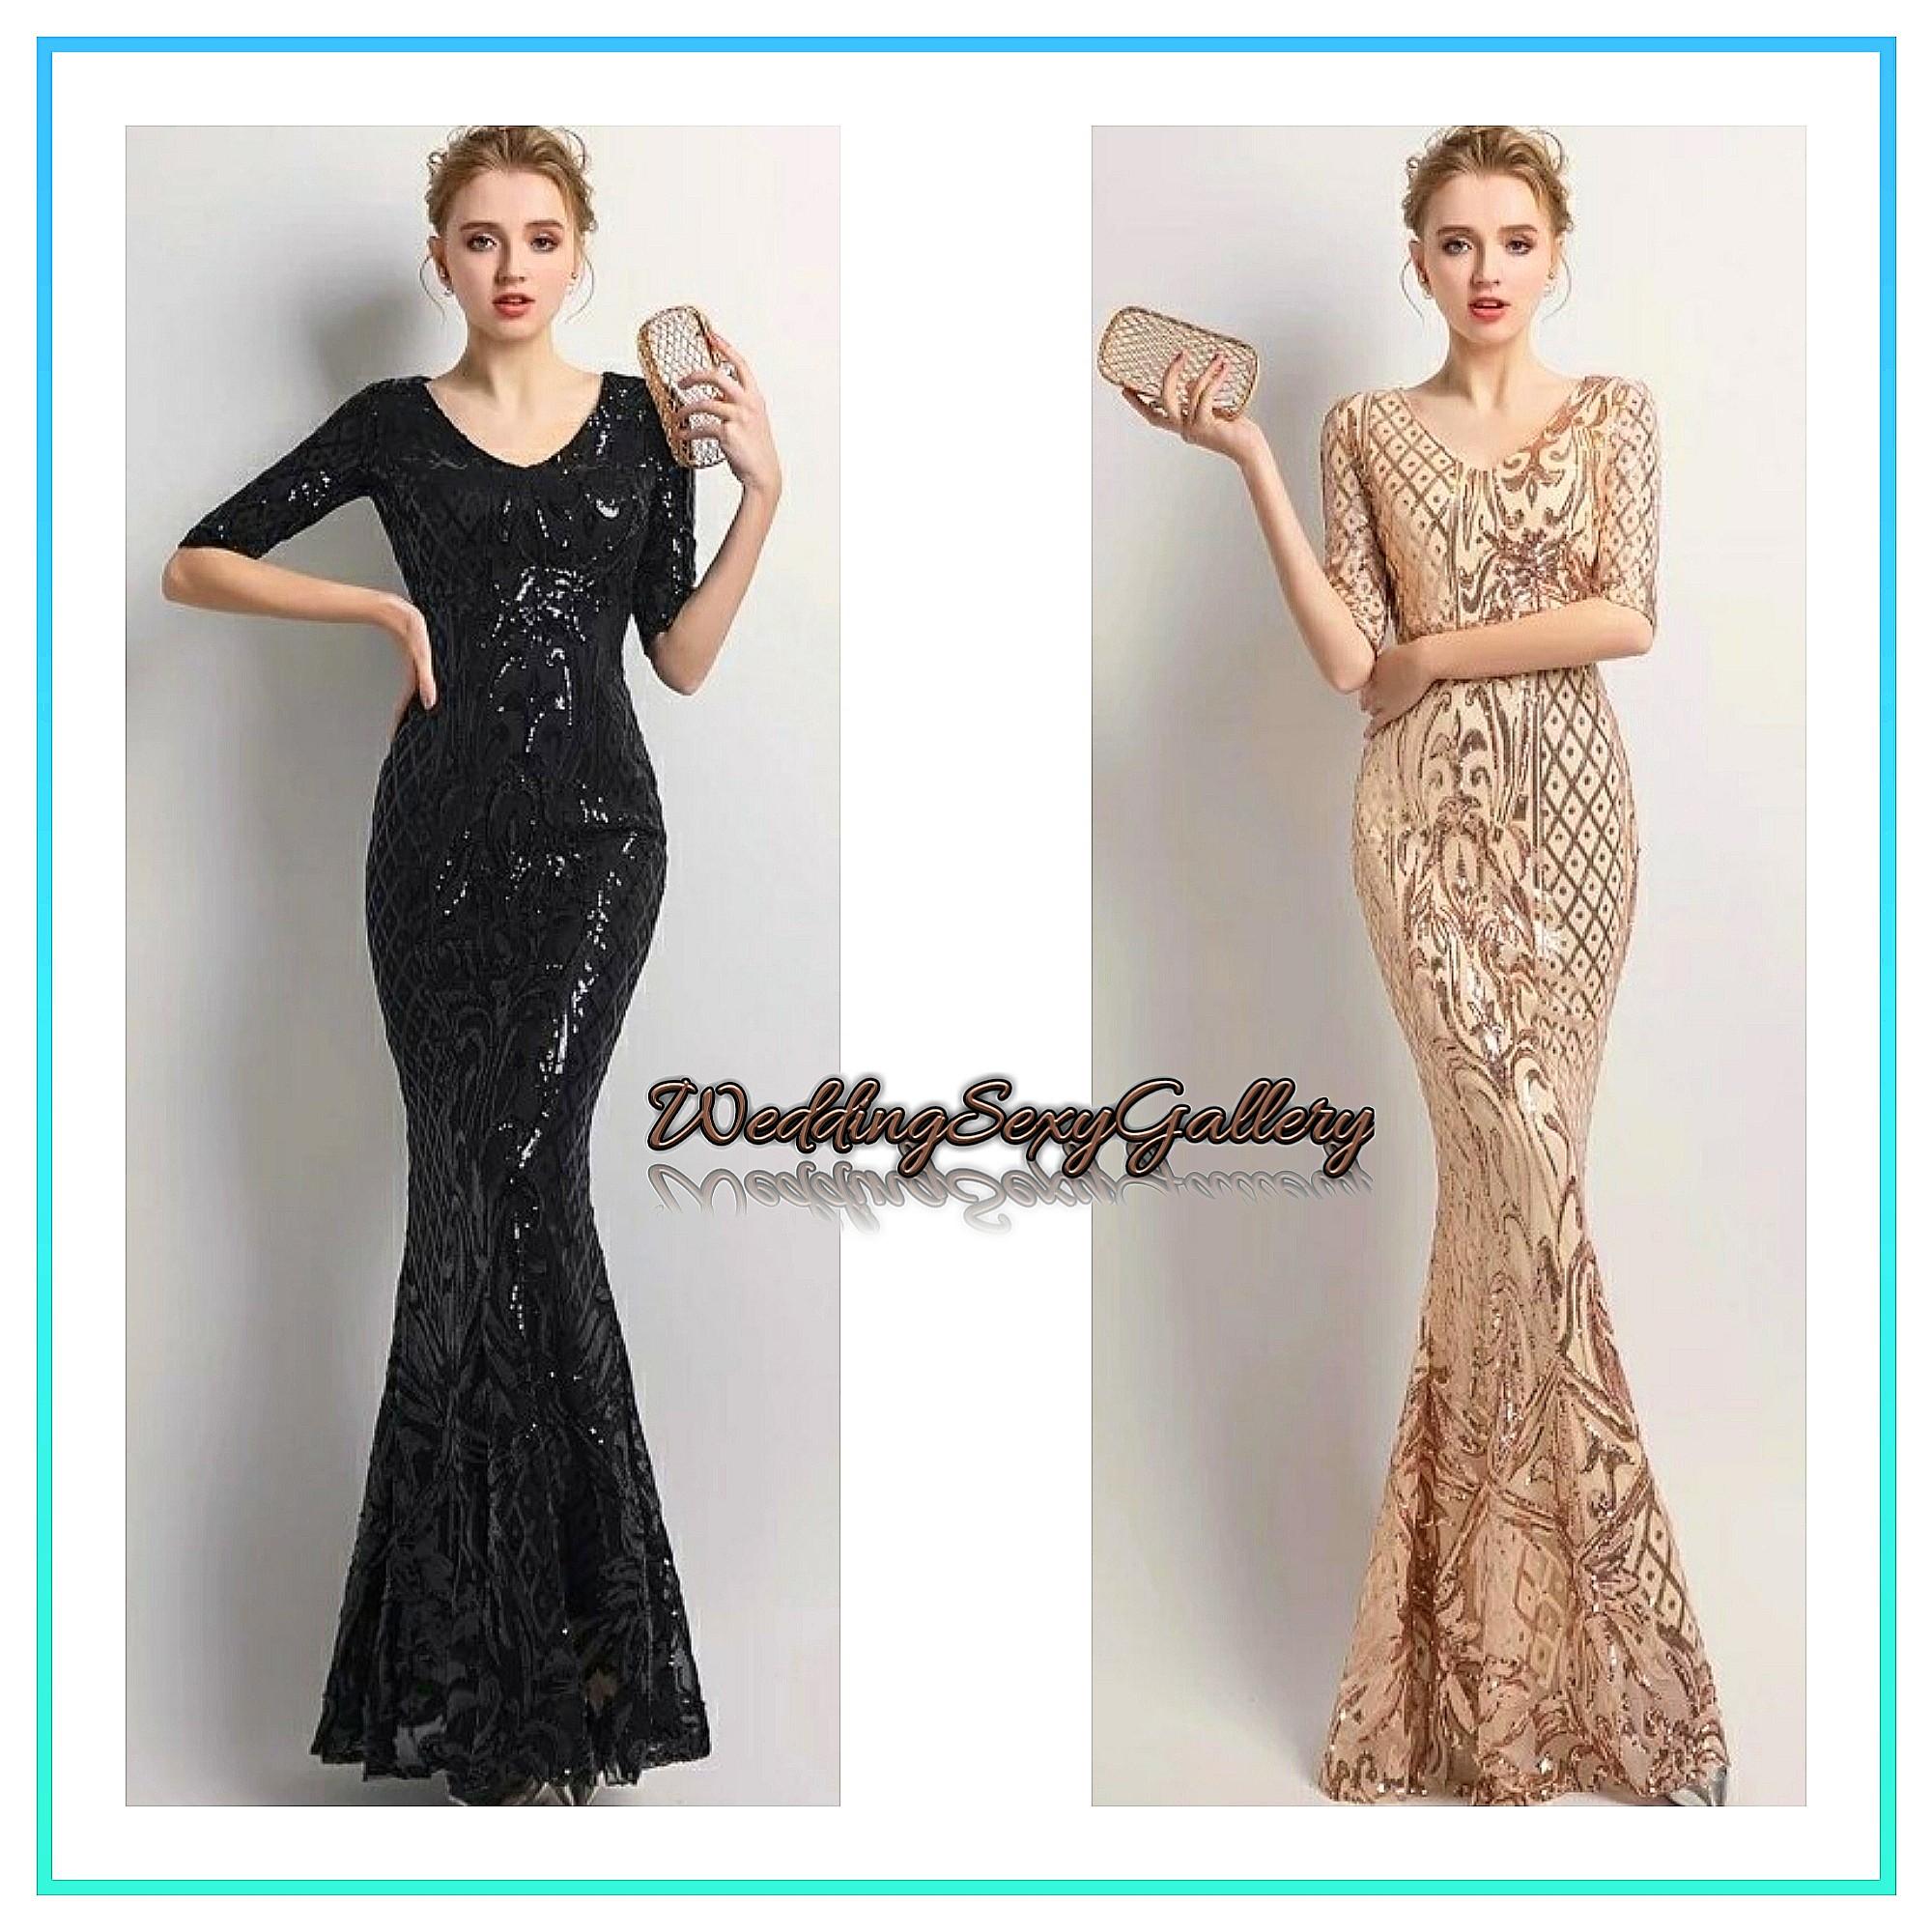 9adf3380ef6 05 🌹⏺🅿🅾⏺🌹YIDINGZS Women s Elegant Mermaid Gold Sequins Dress ...